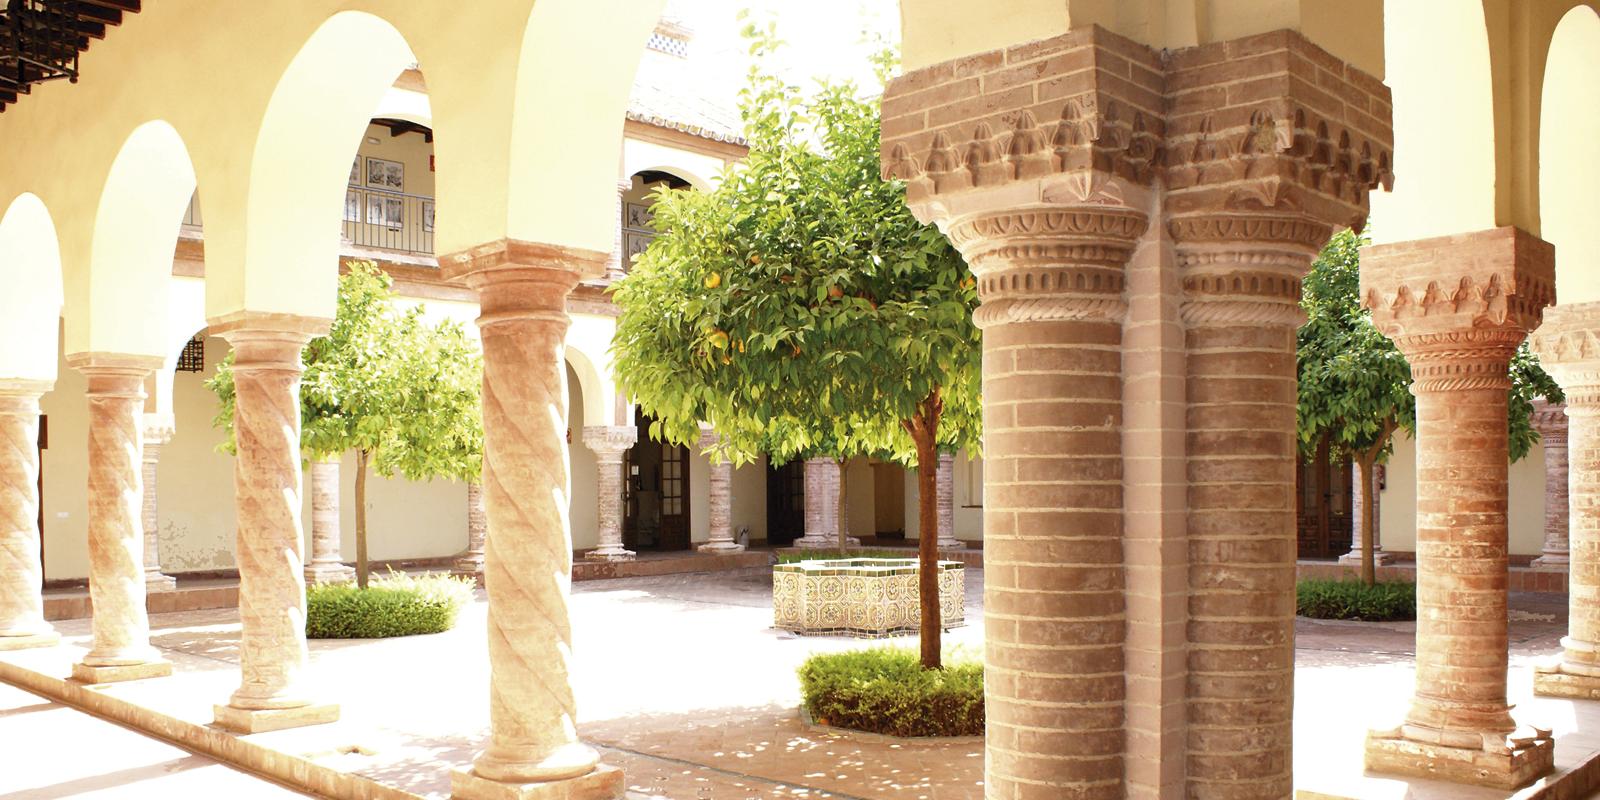 Hotel en Córdoba Convento de Santa Clara convento